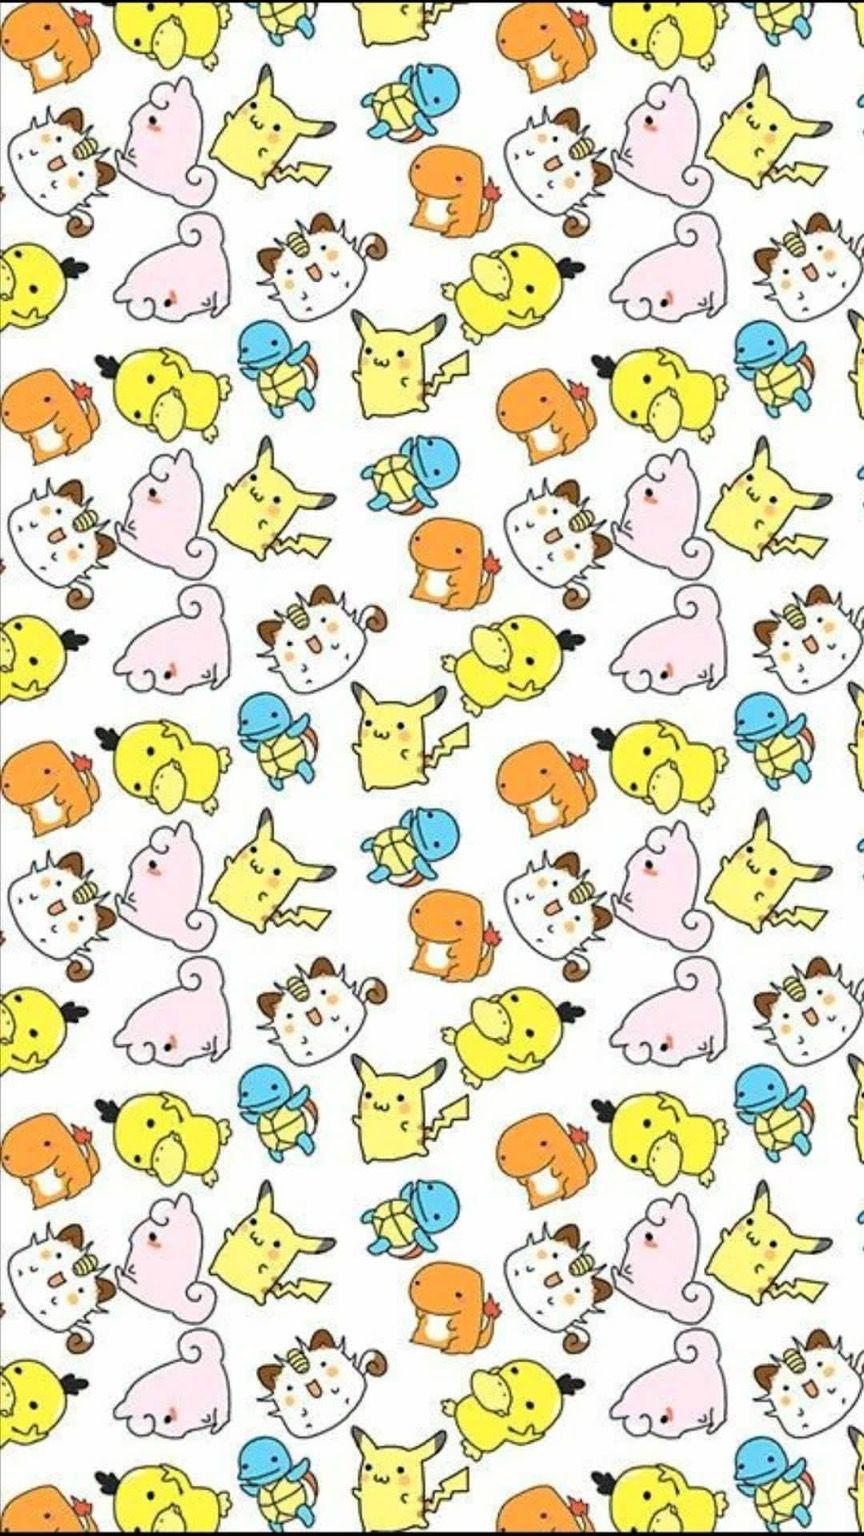 Pokemon Wallpaper おしゃれまとめの人気アイデア Pinterest